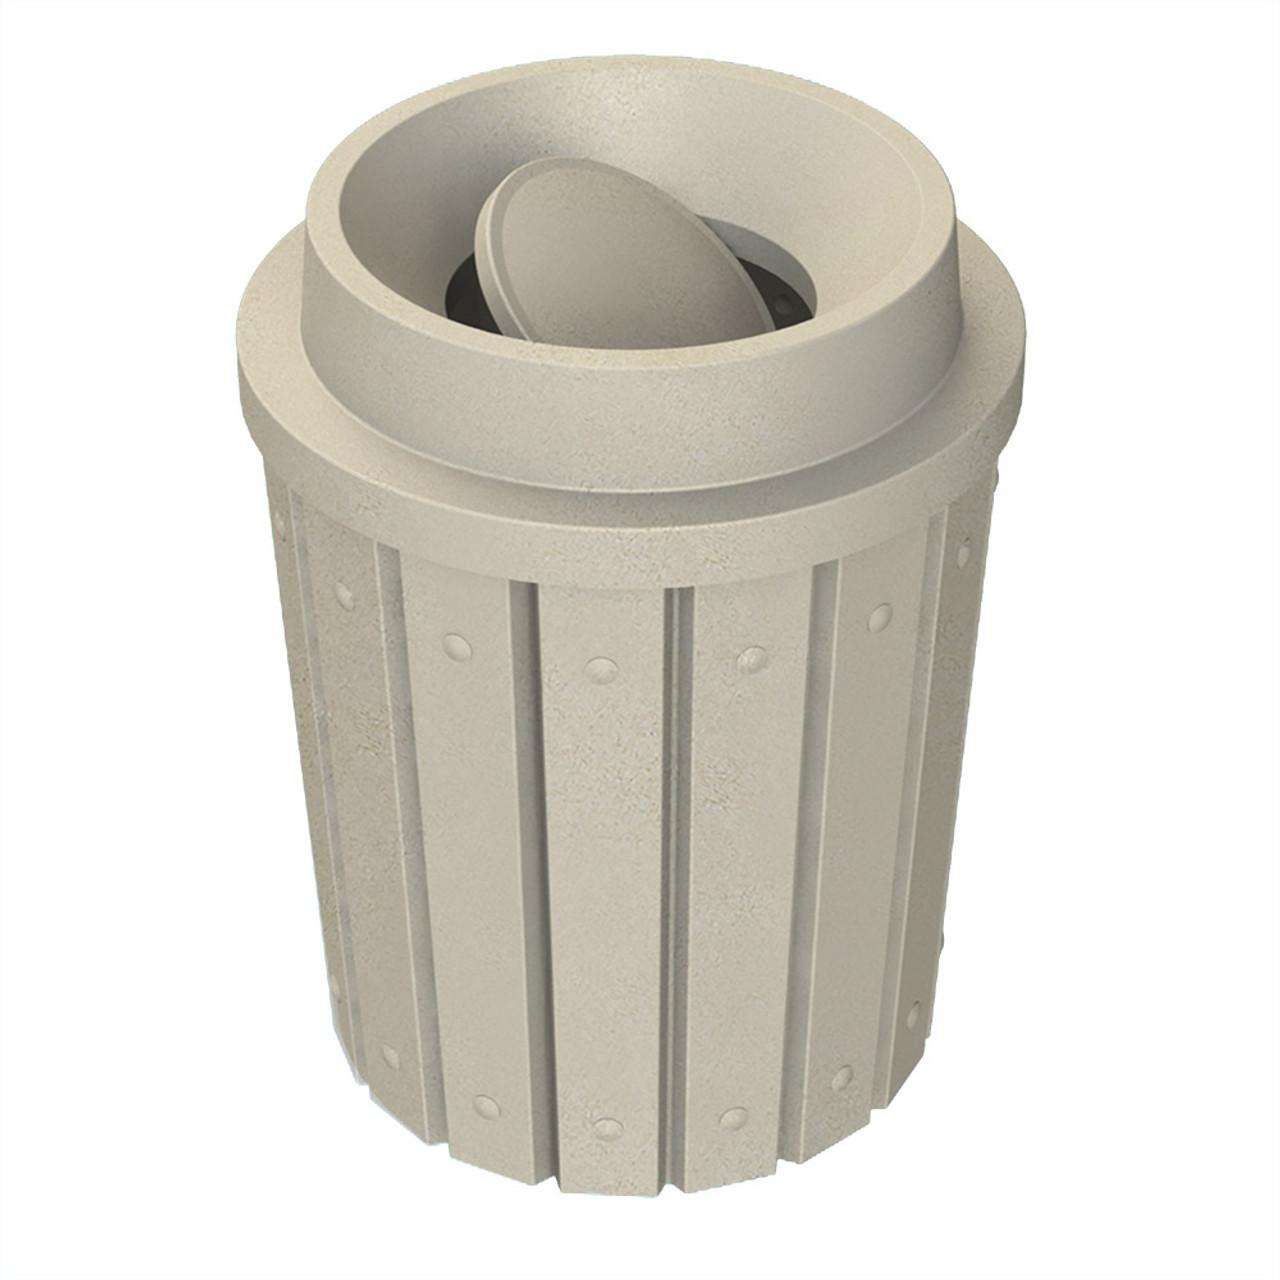 42 Gallon Heavy Duty Bug Barrier Funnel Top Trash Can S8286A-00 BEIGE GRANITE